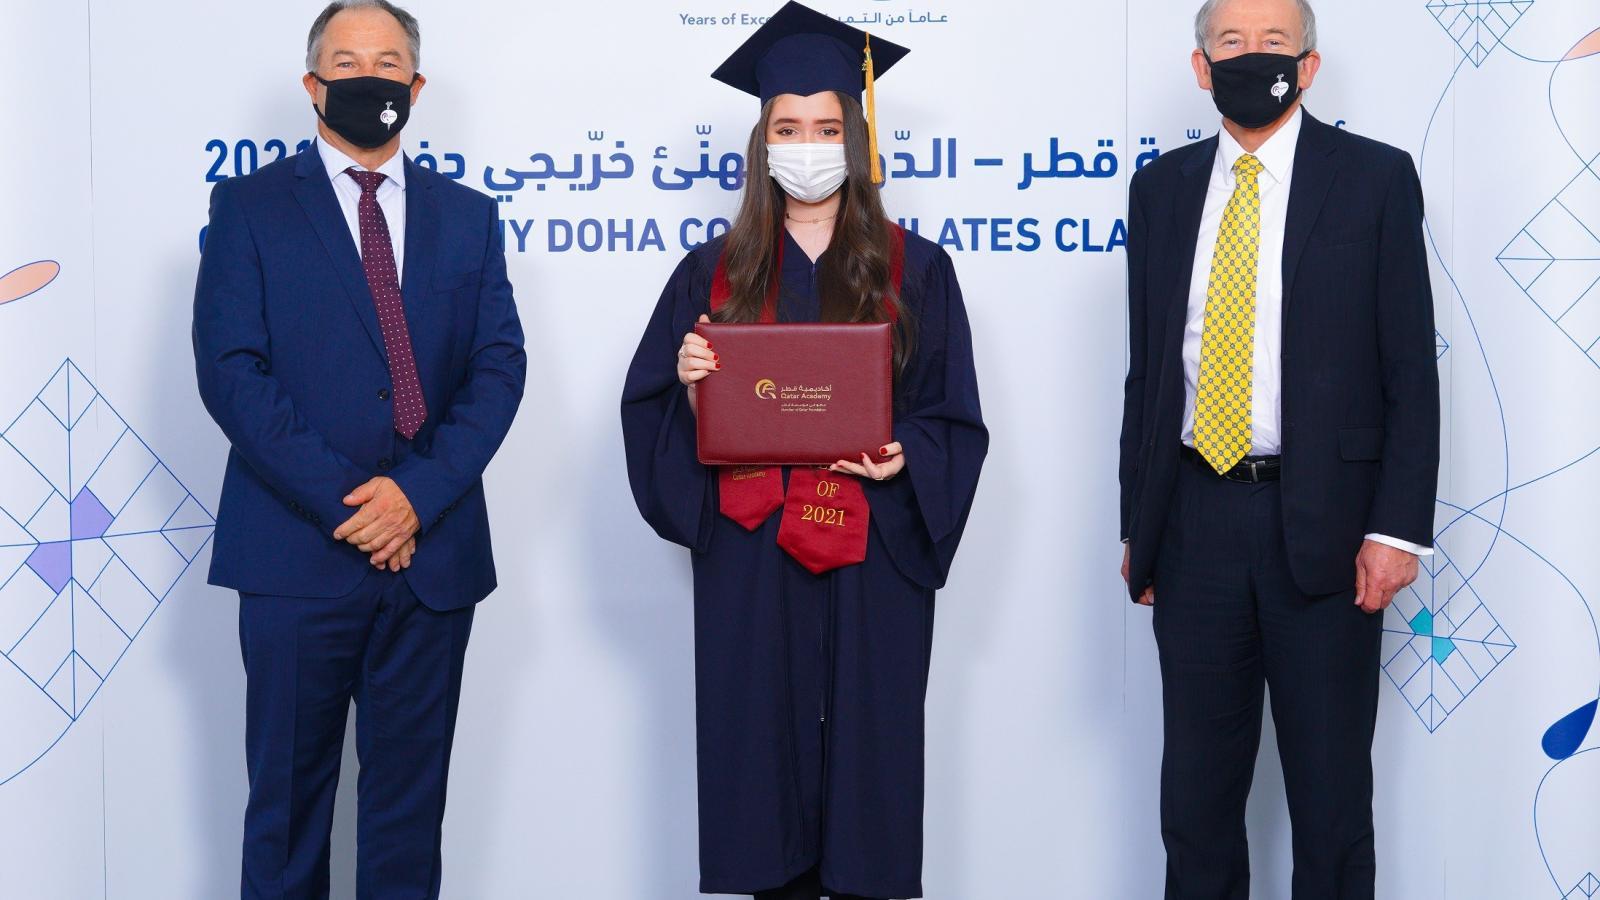 QF schools host virtual ceremonies to celebrate graduating students